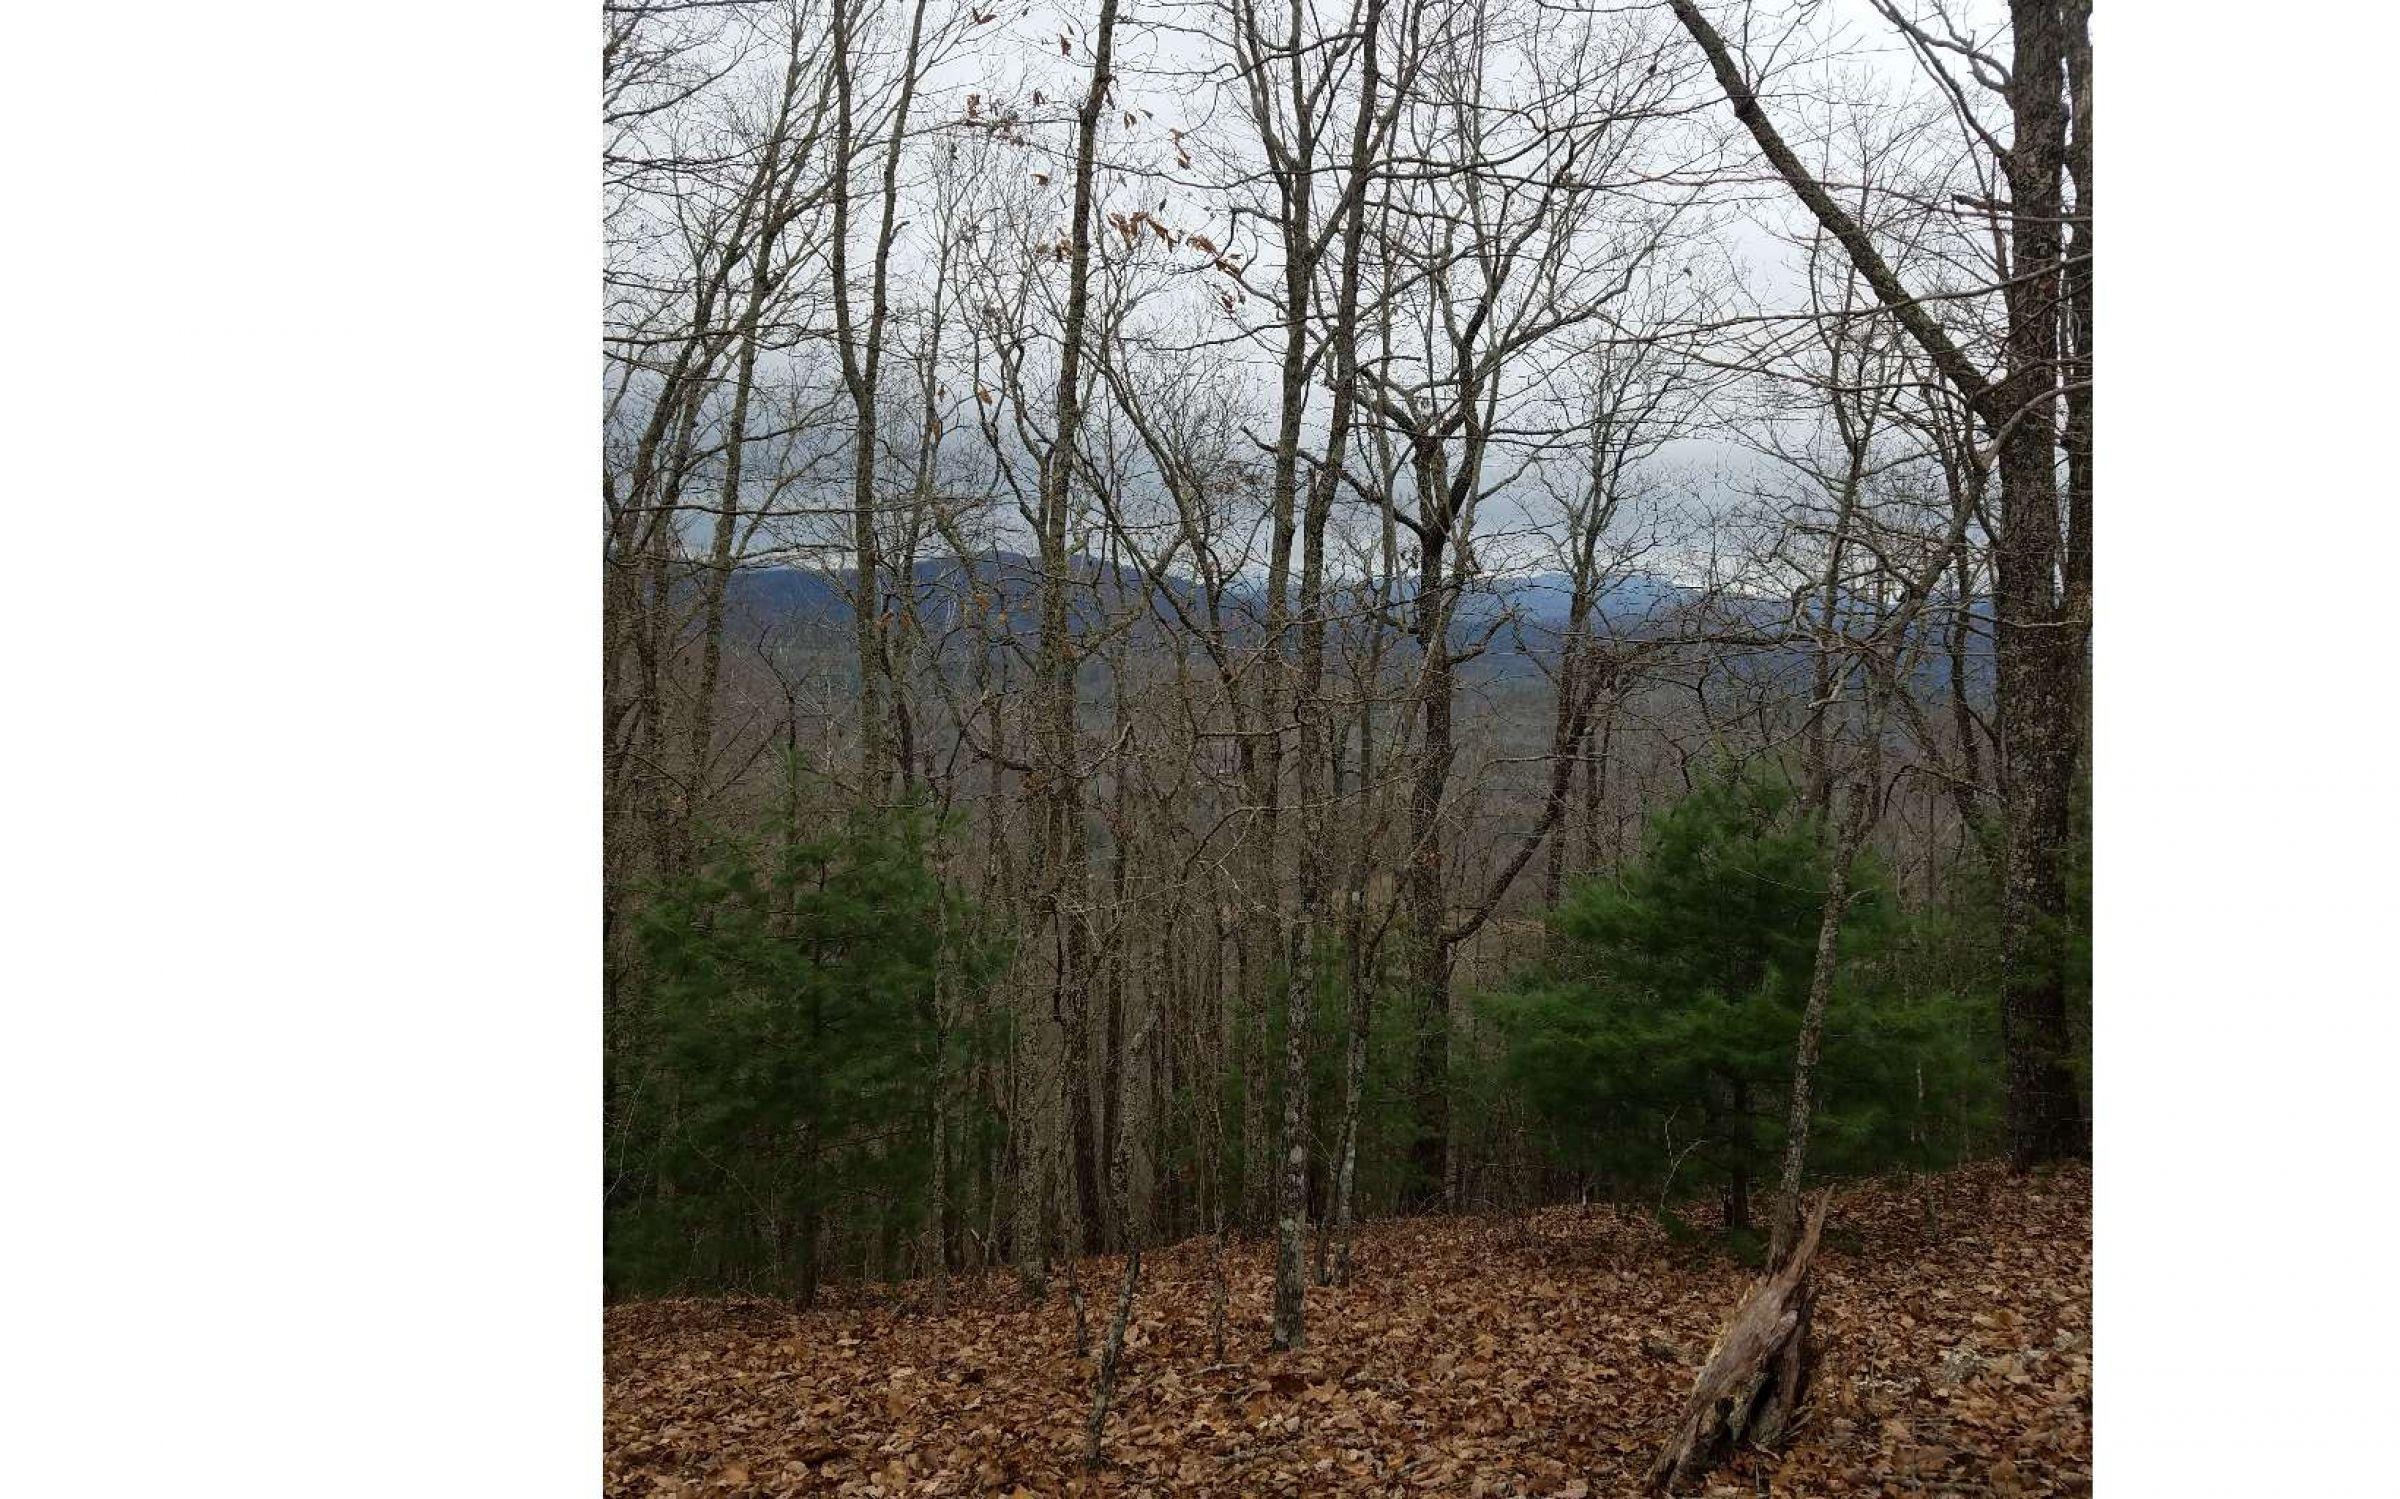 land-sharp-county-arkansas-80-acres-listing-number-15013-0-2020-06-10-155709.jpg